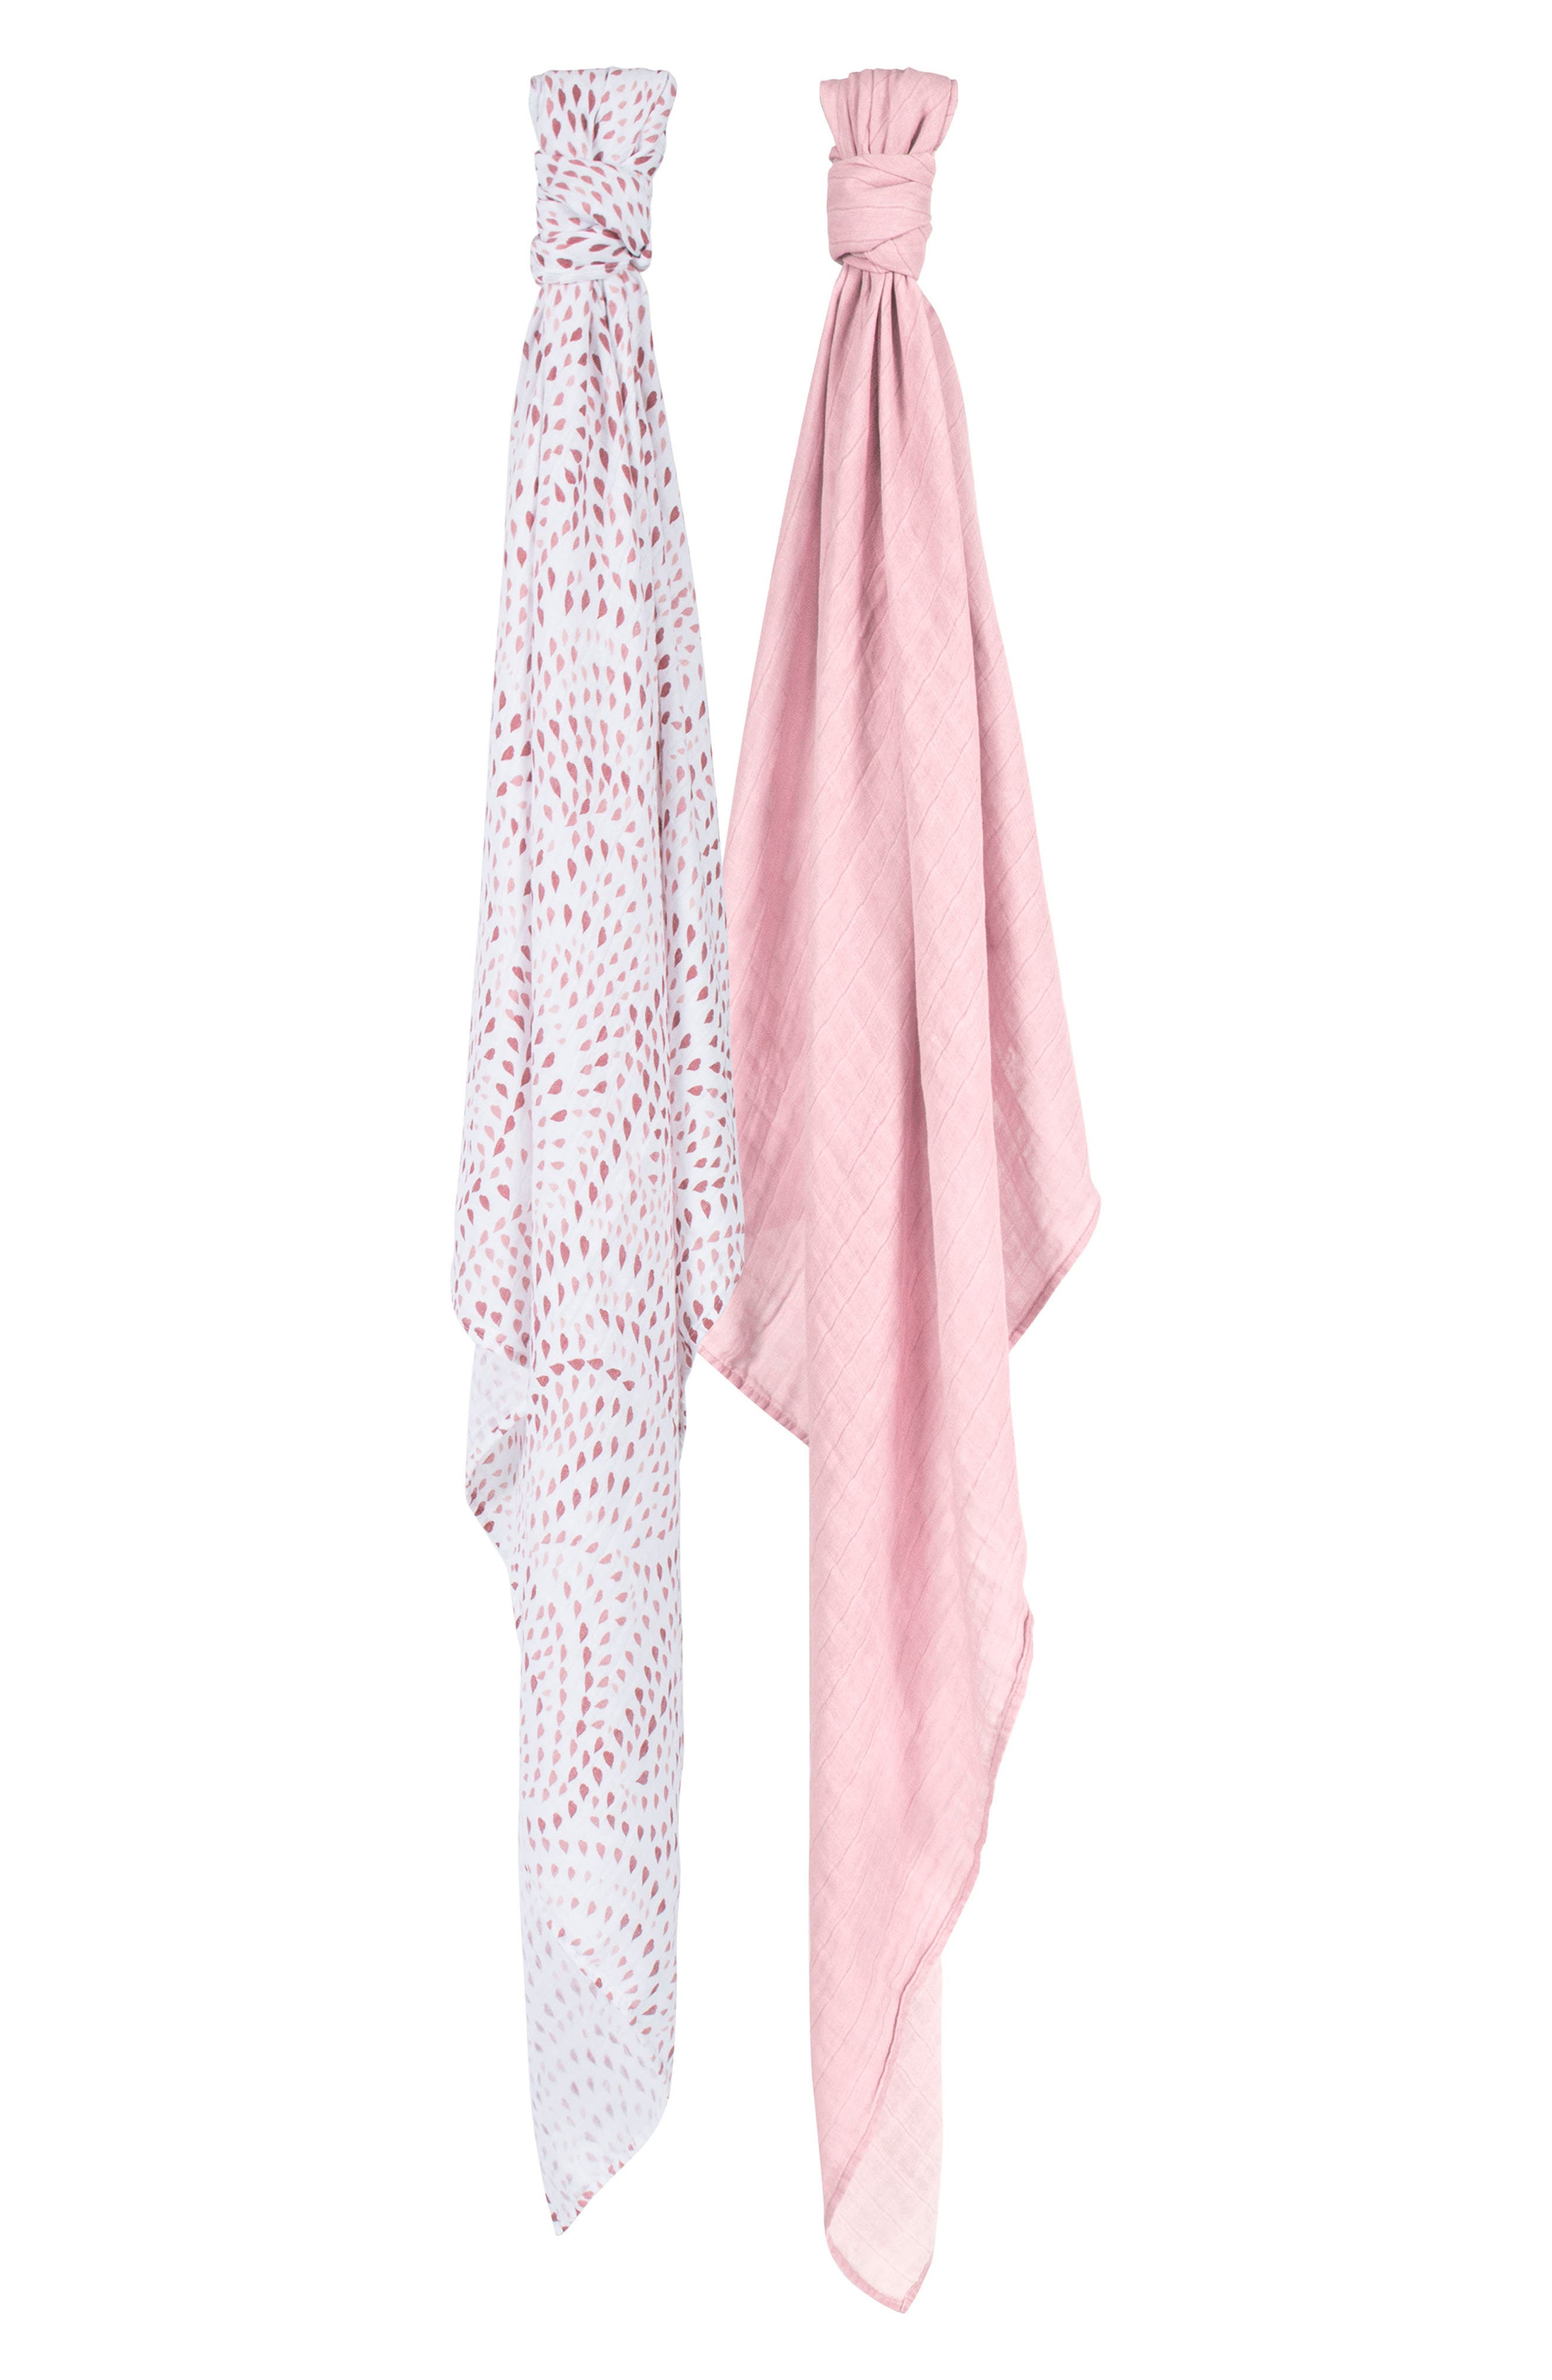 2-Pack Muslin Swaddle Blankets,                             Main thumbnail 1, color,                             Rose Quartz And Petal